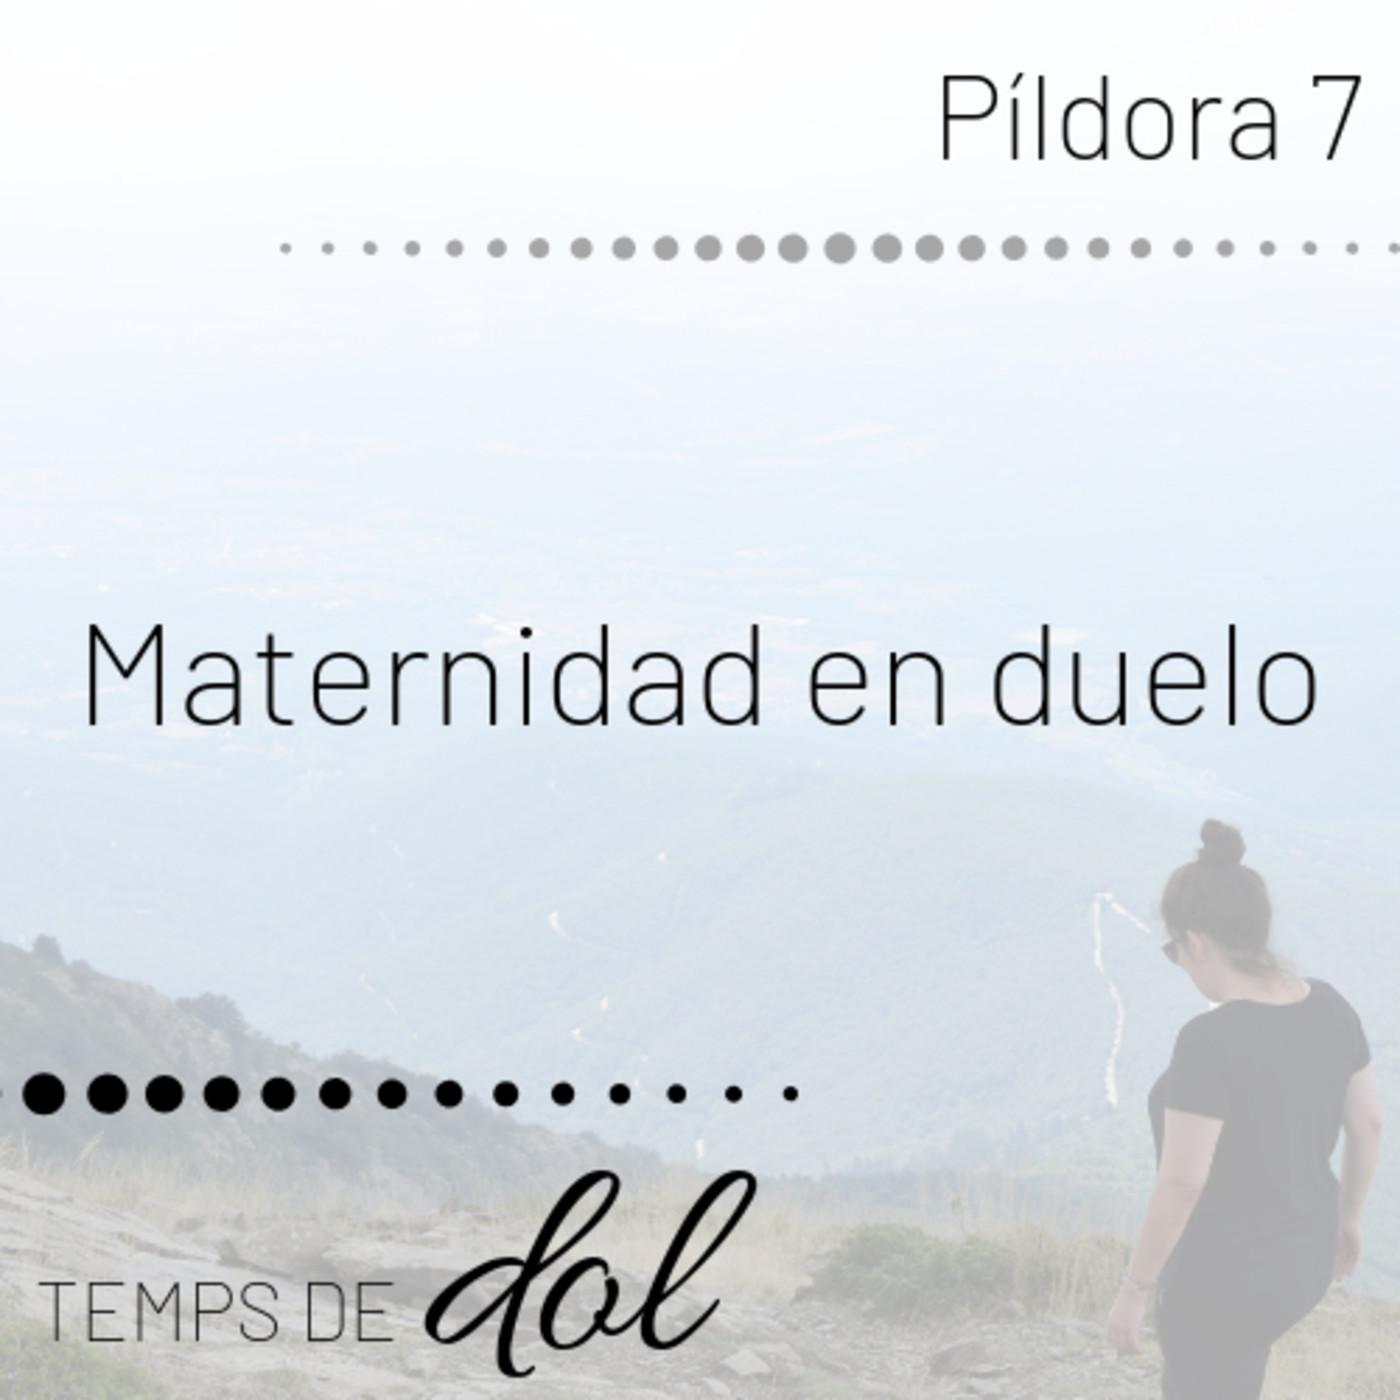 Píldora 7. Maternidad en duelo